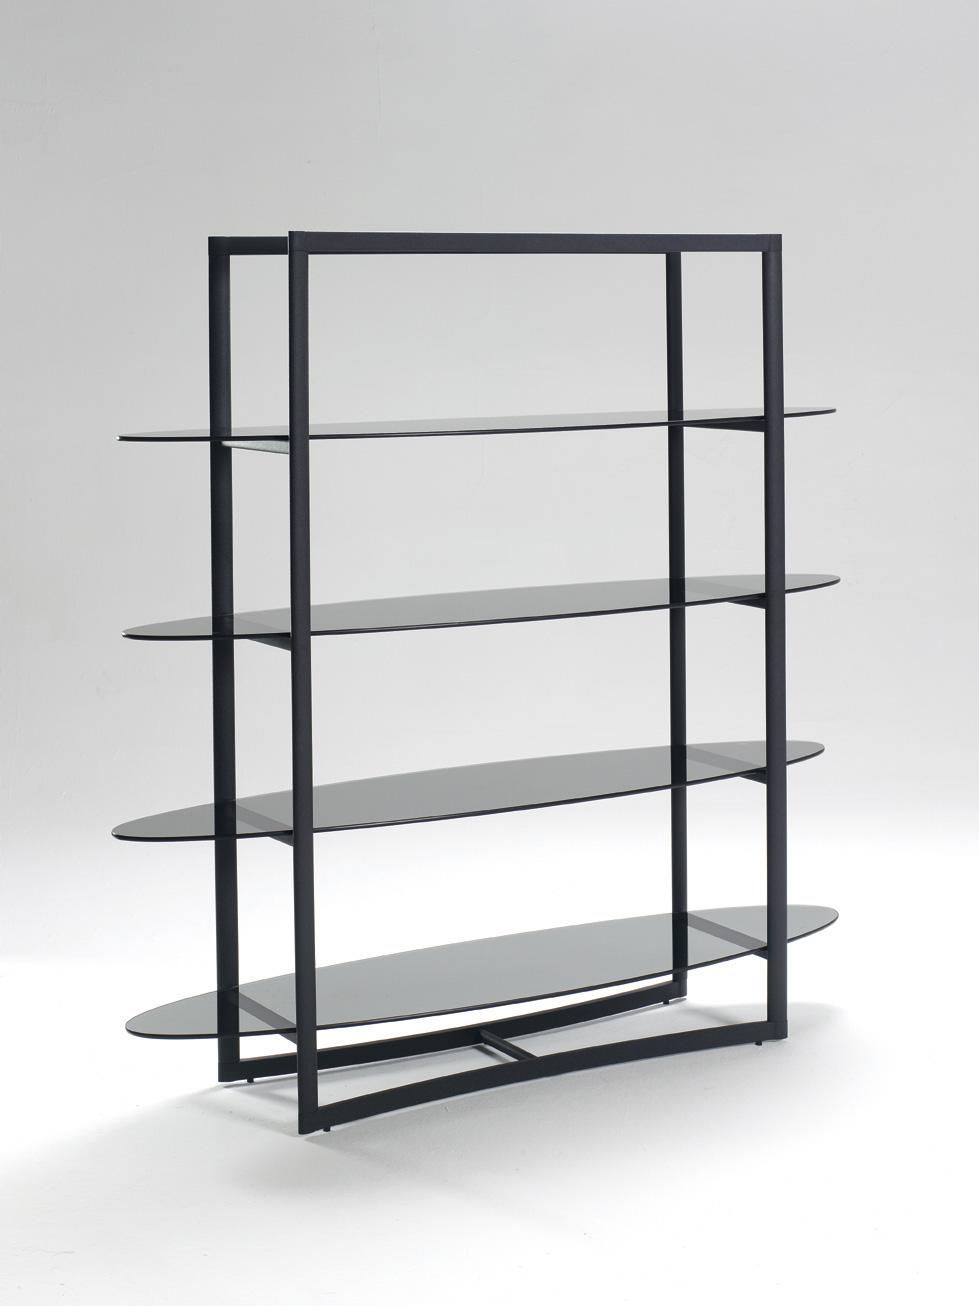 Estanteria oval de cristal estanter as muebles de - Estanterias de cristal ...